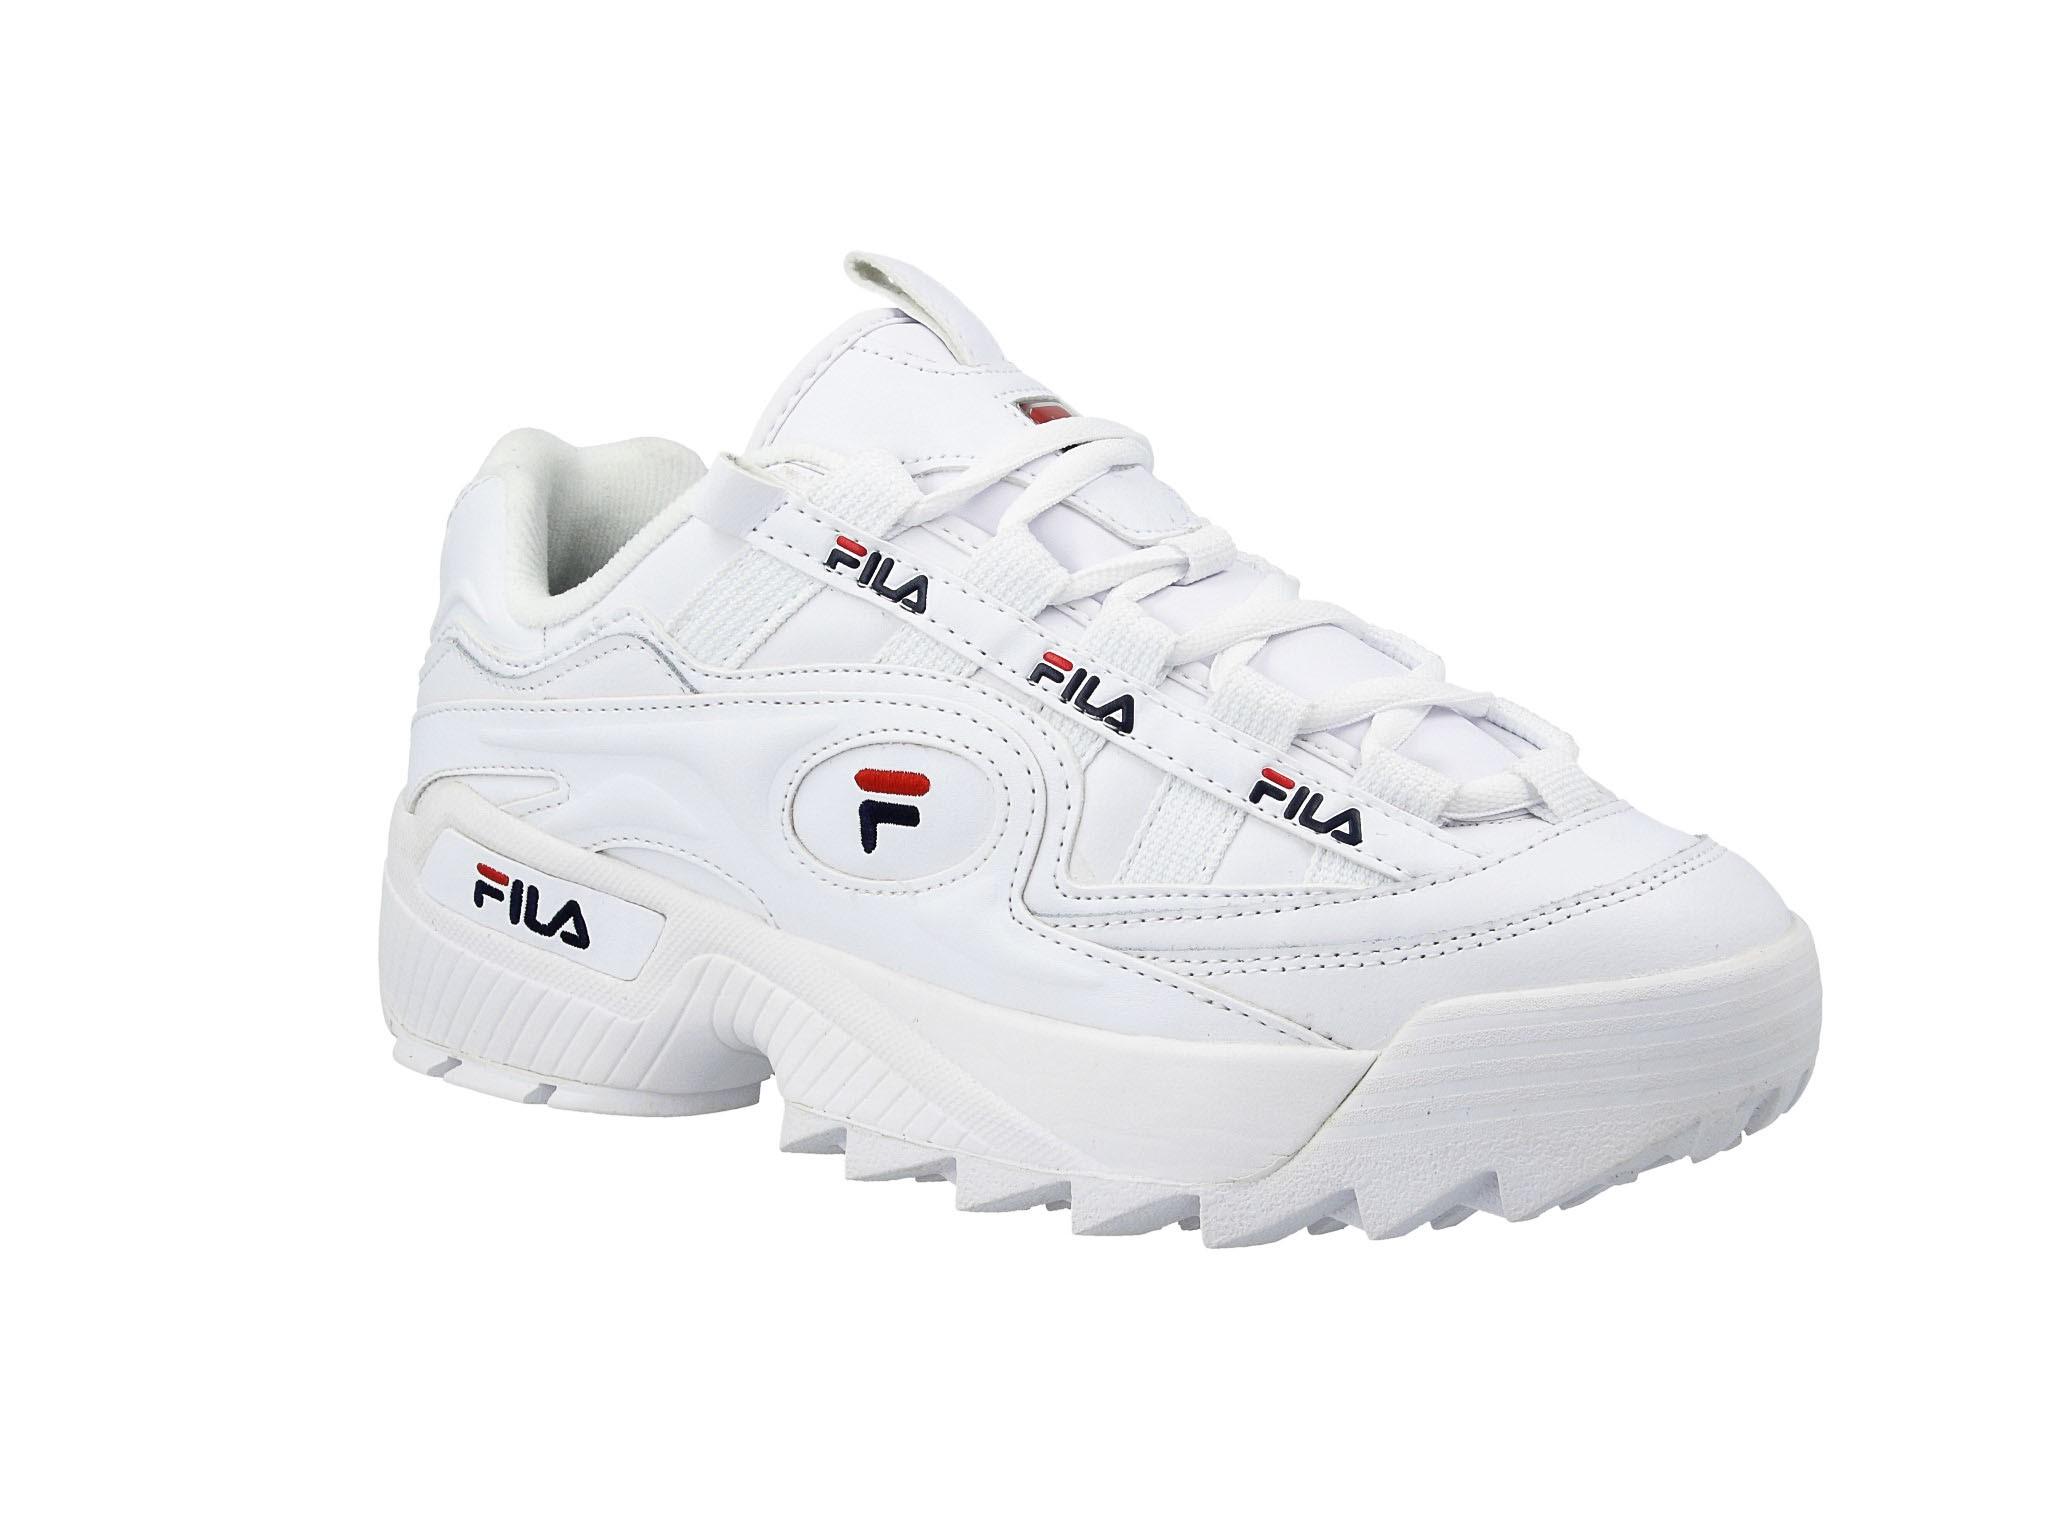 Białe D Formation Wmn 125 White FILA Navy FILA Red